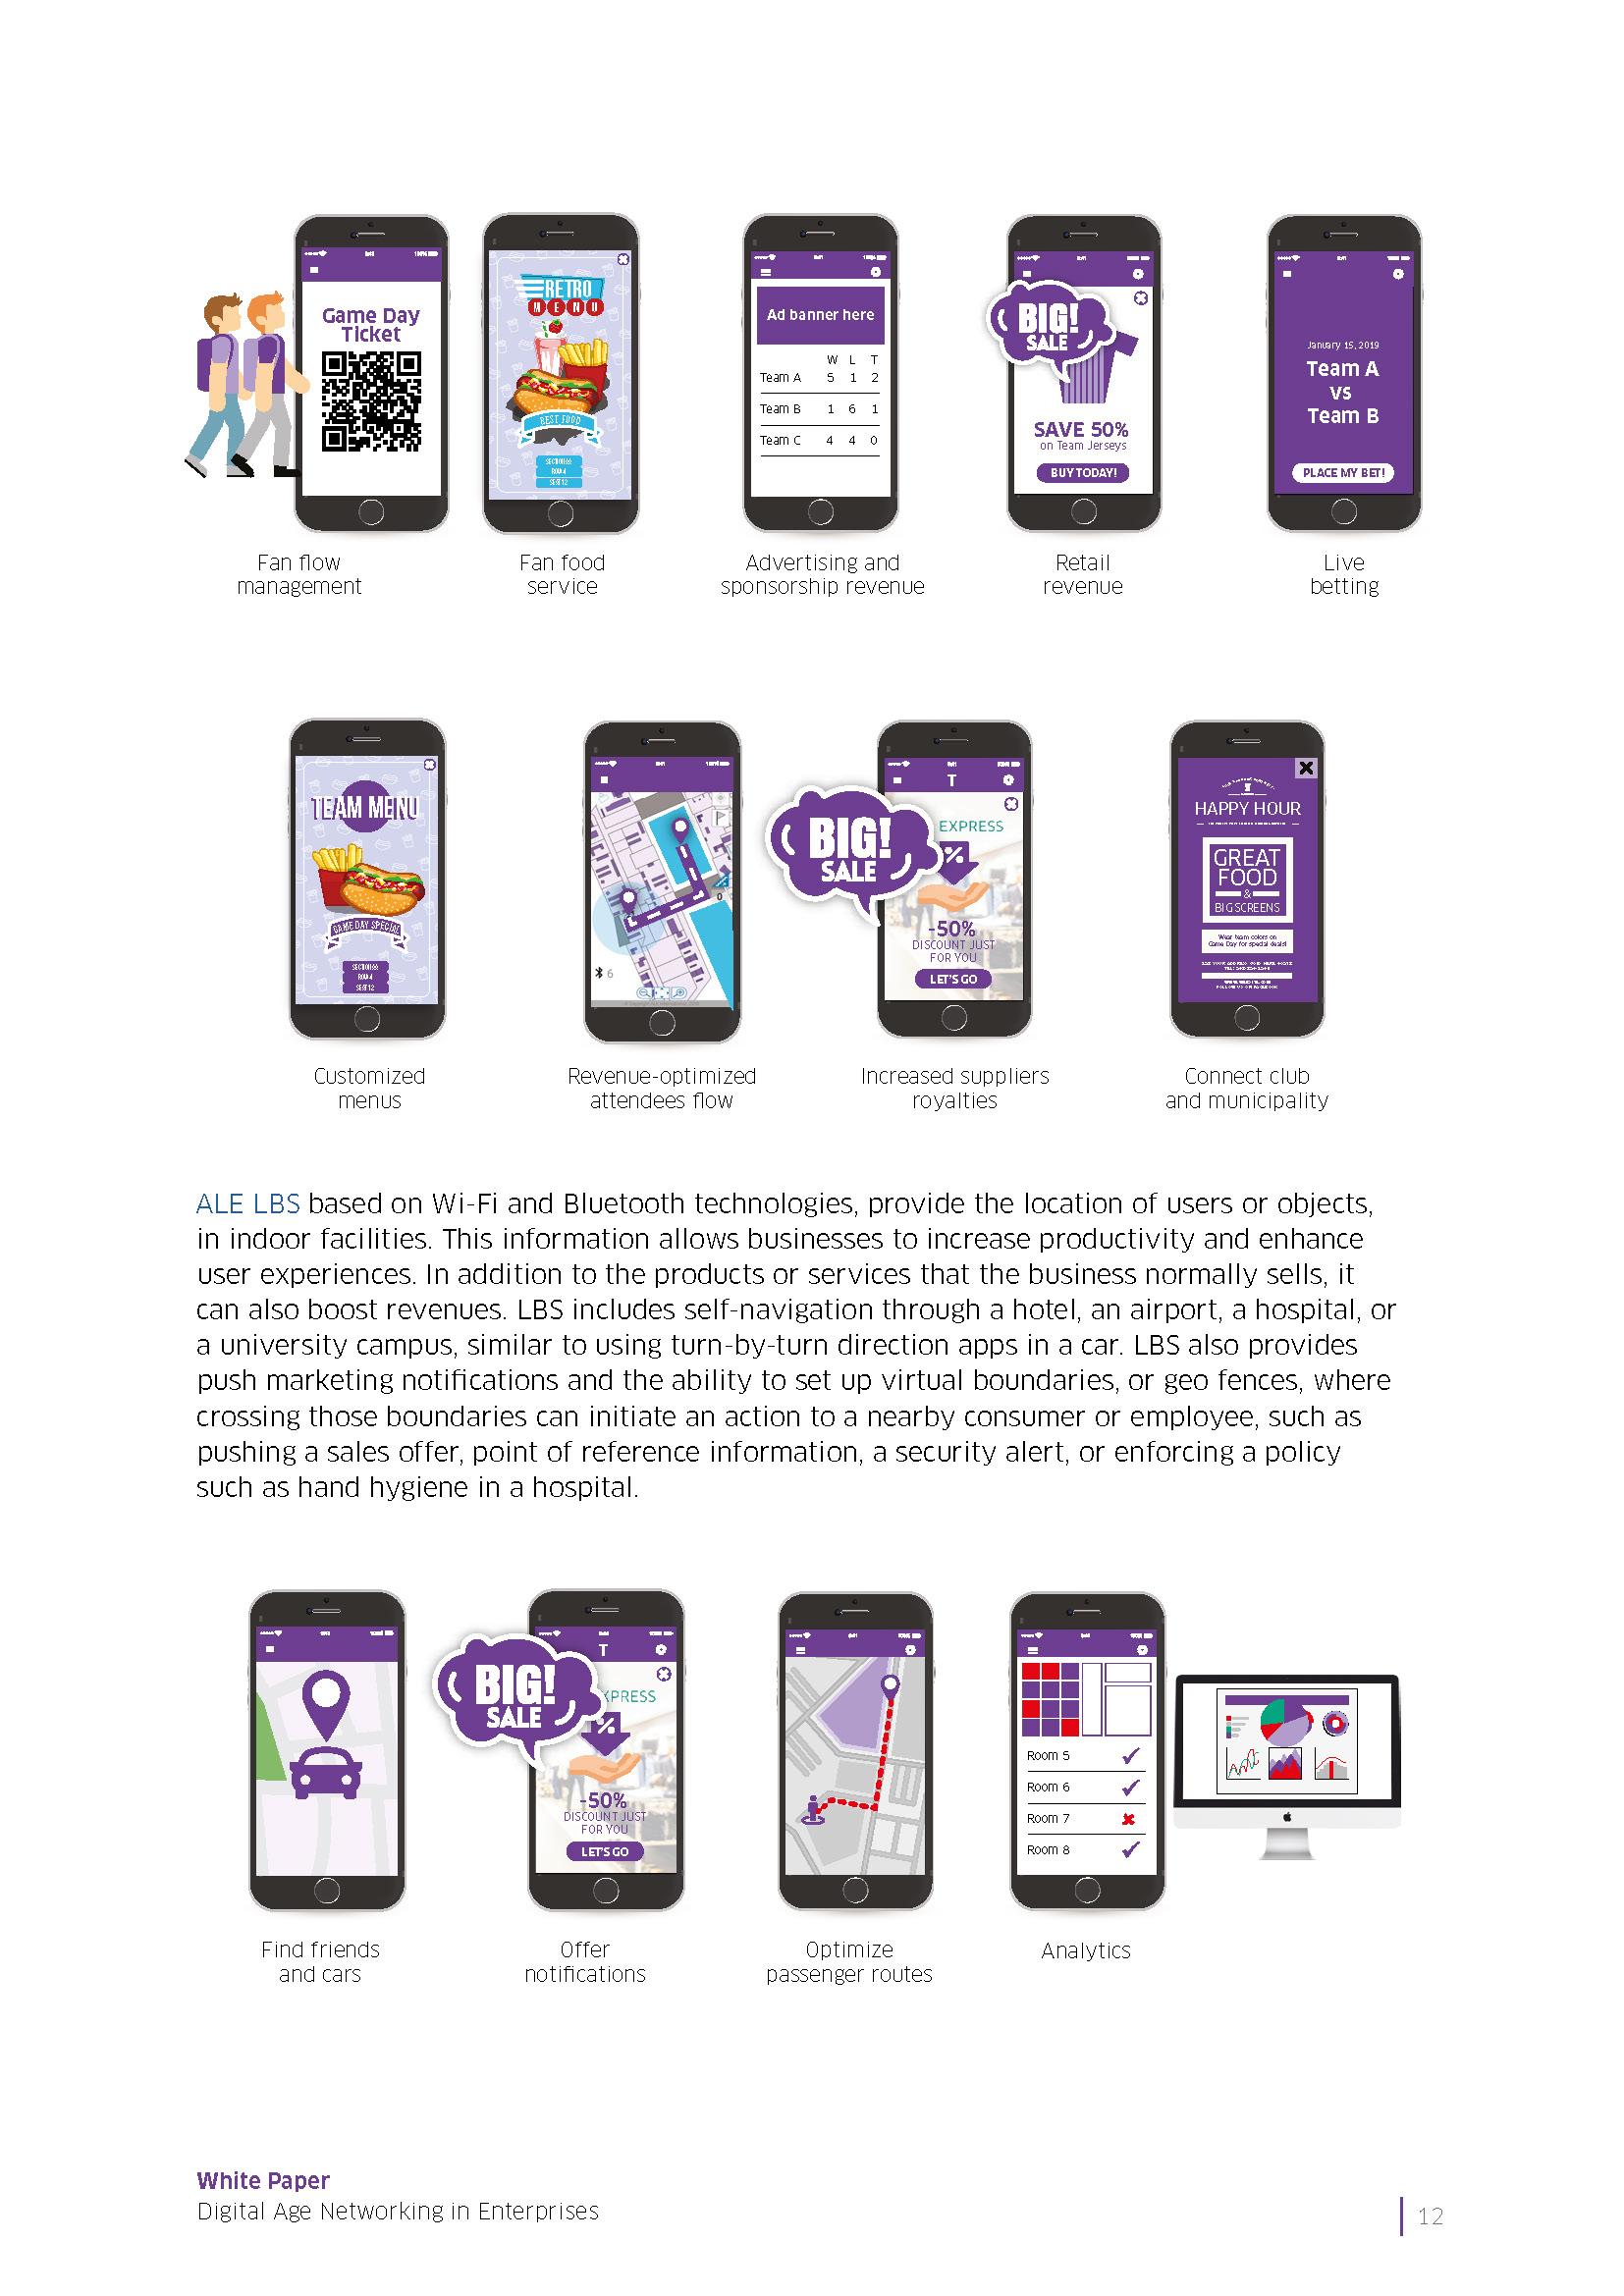 digital-age-networking-enterprises_Page_12